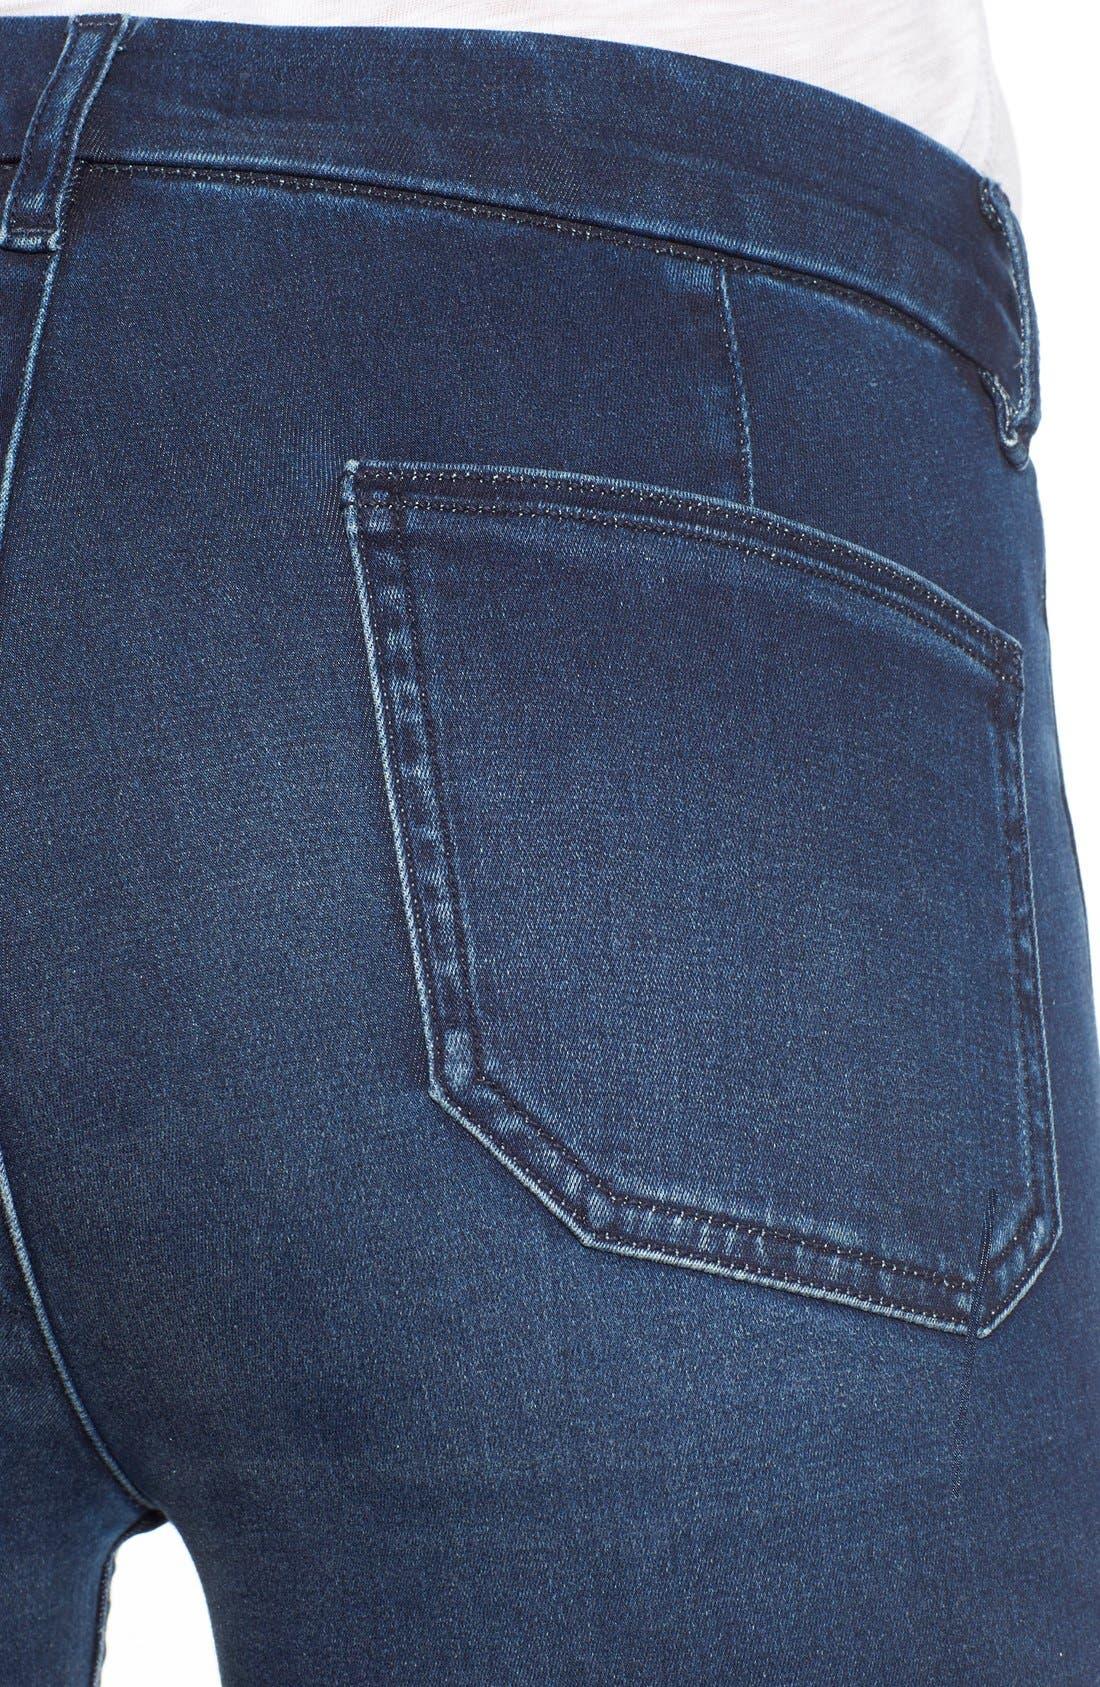 Alternate Image 4  - M.i.h. Jeans 'Superfit Marrakesh' Flare Jeans (Circle Blue)